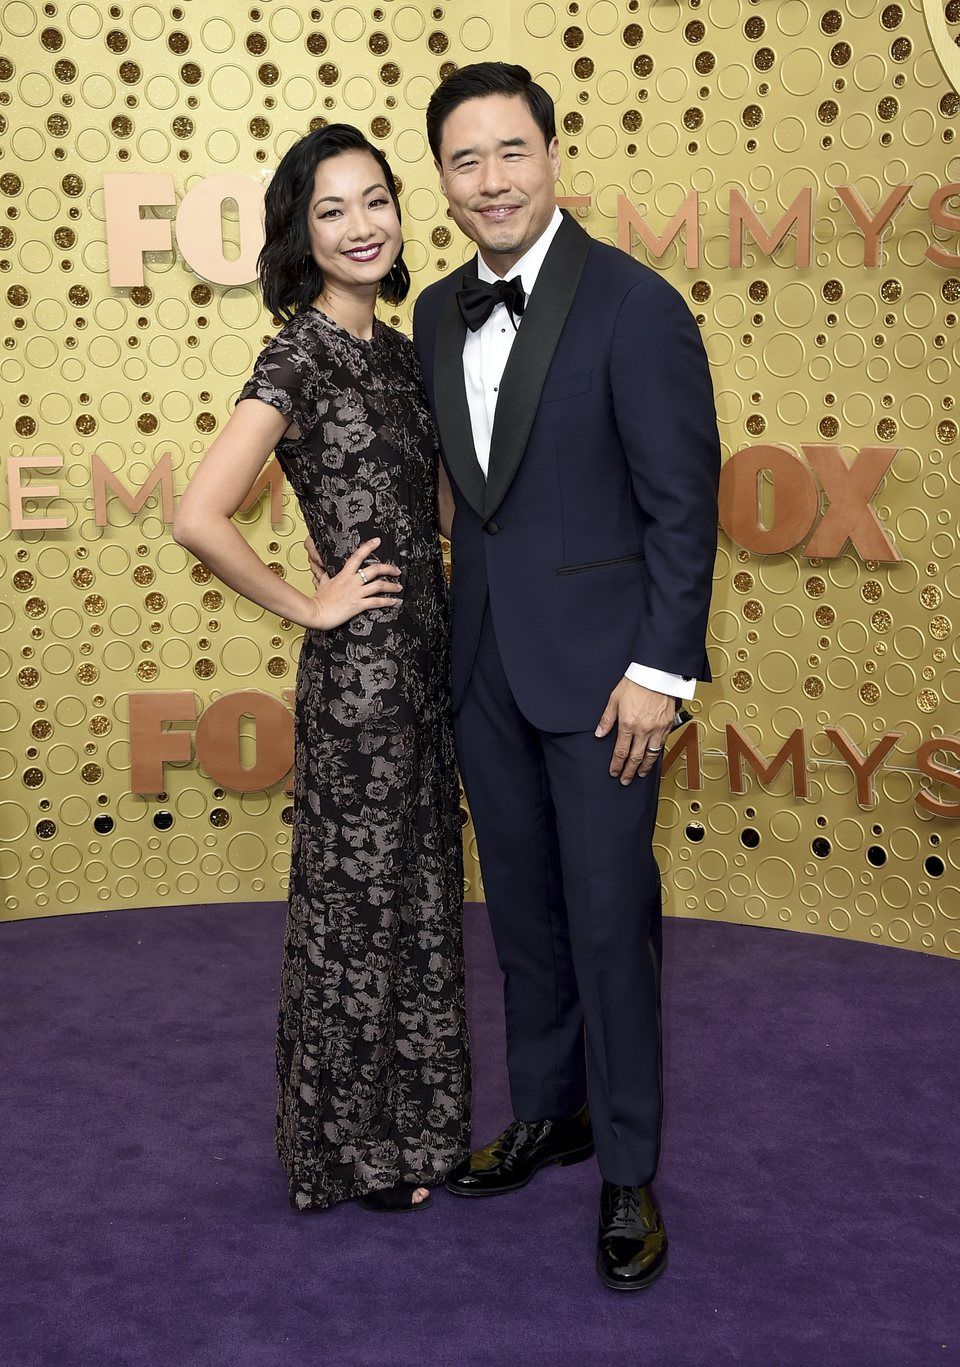 Randall Park en la alfombra roja de los Emmy 2019